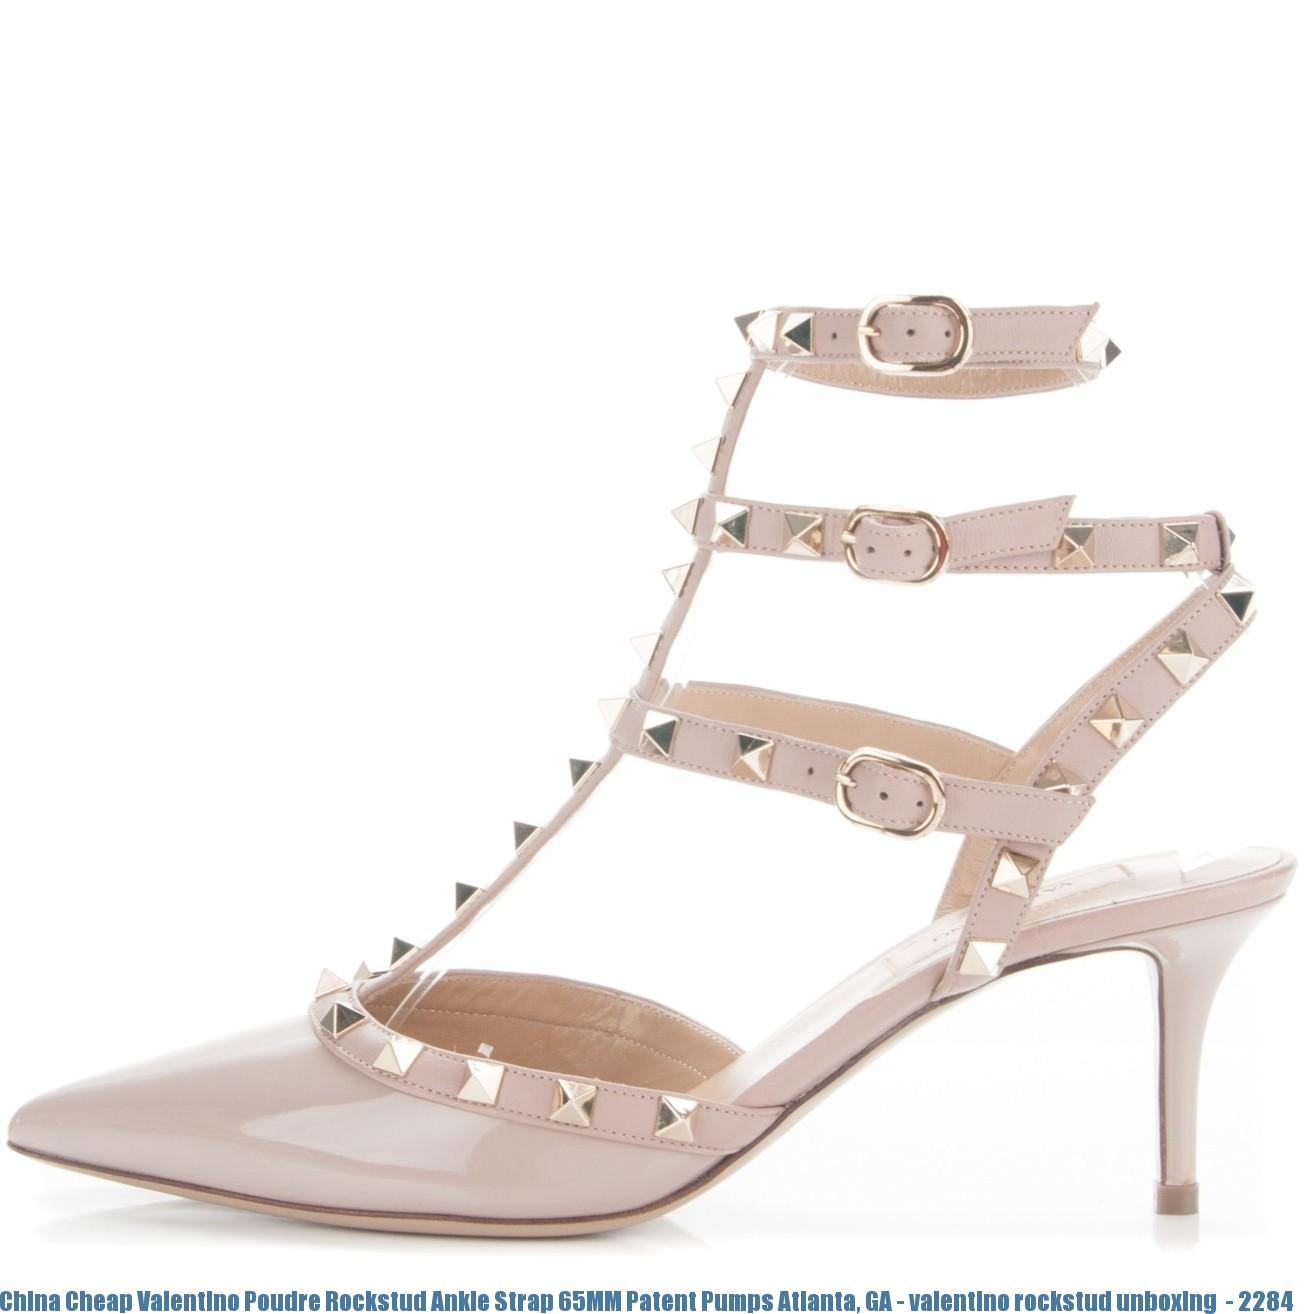 e4b8aeae8a06 China Cheap Valentino Poudre Rockstud Ankle Strap 65MM Patent Pumps ...